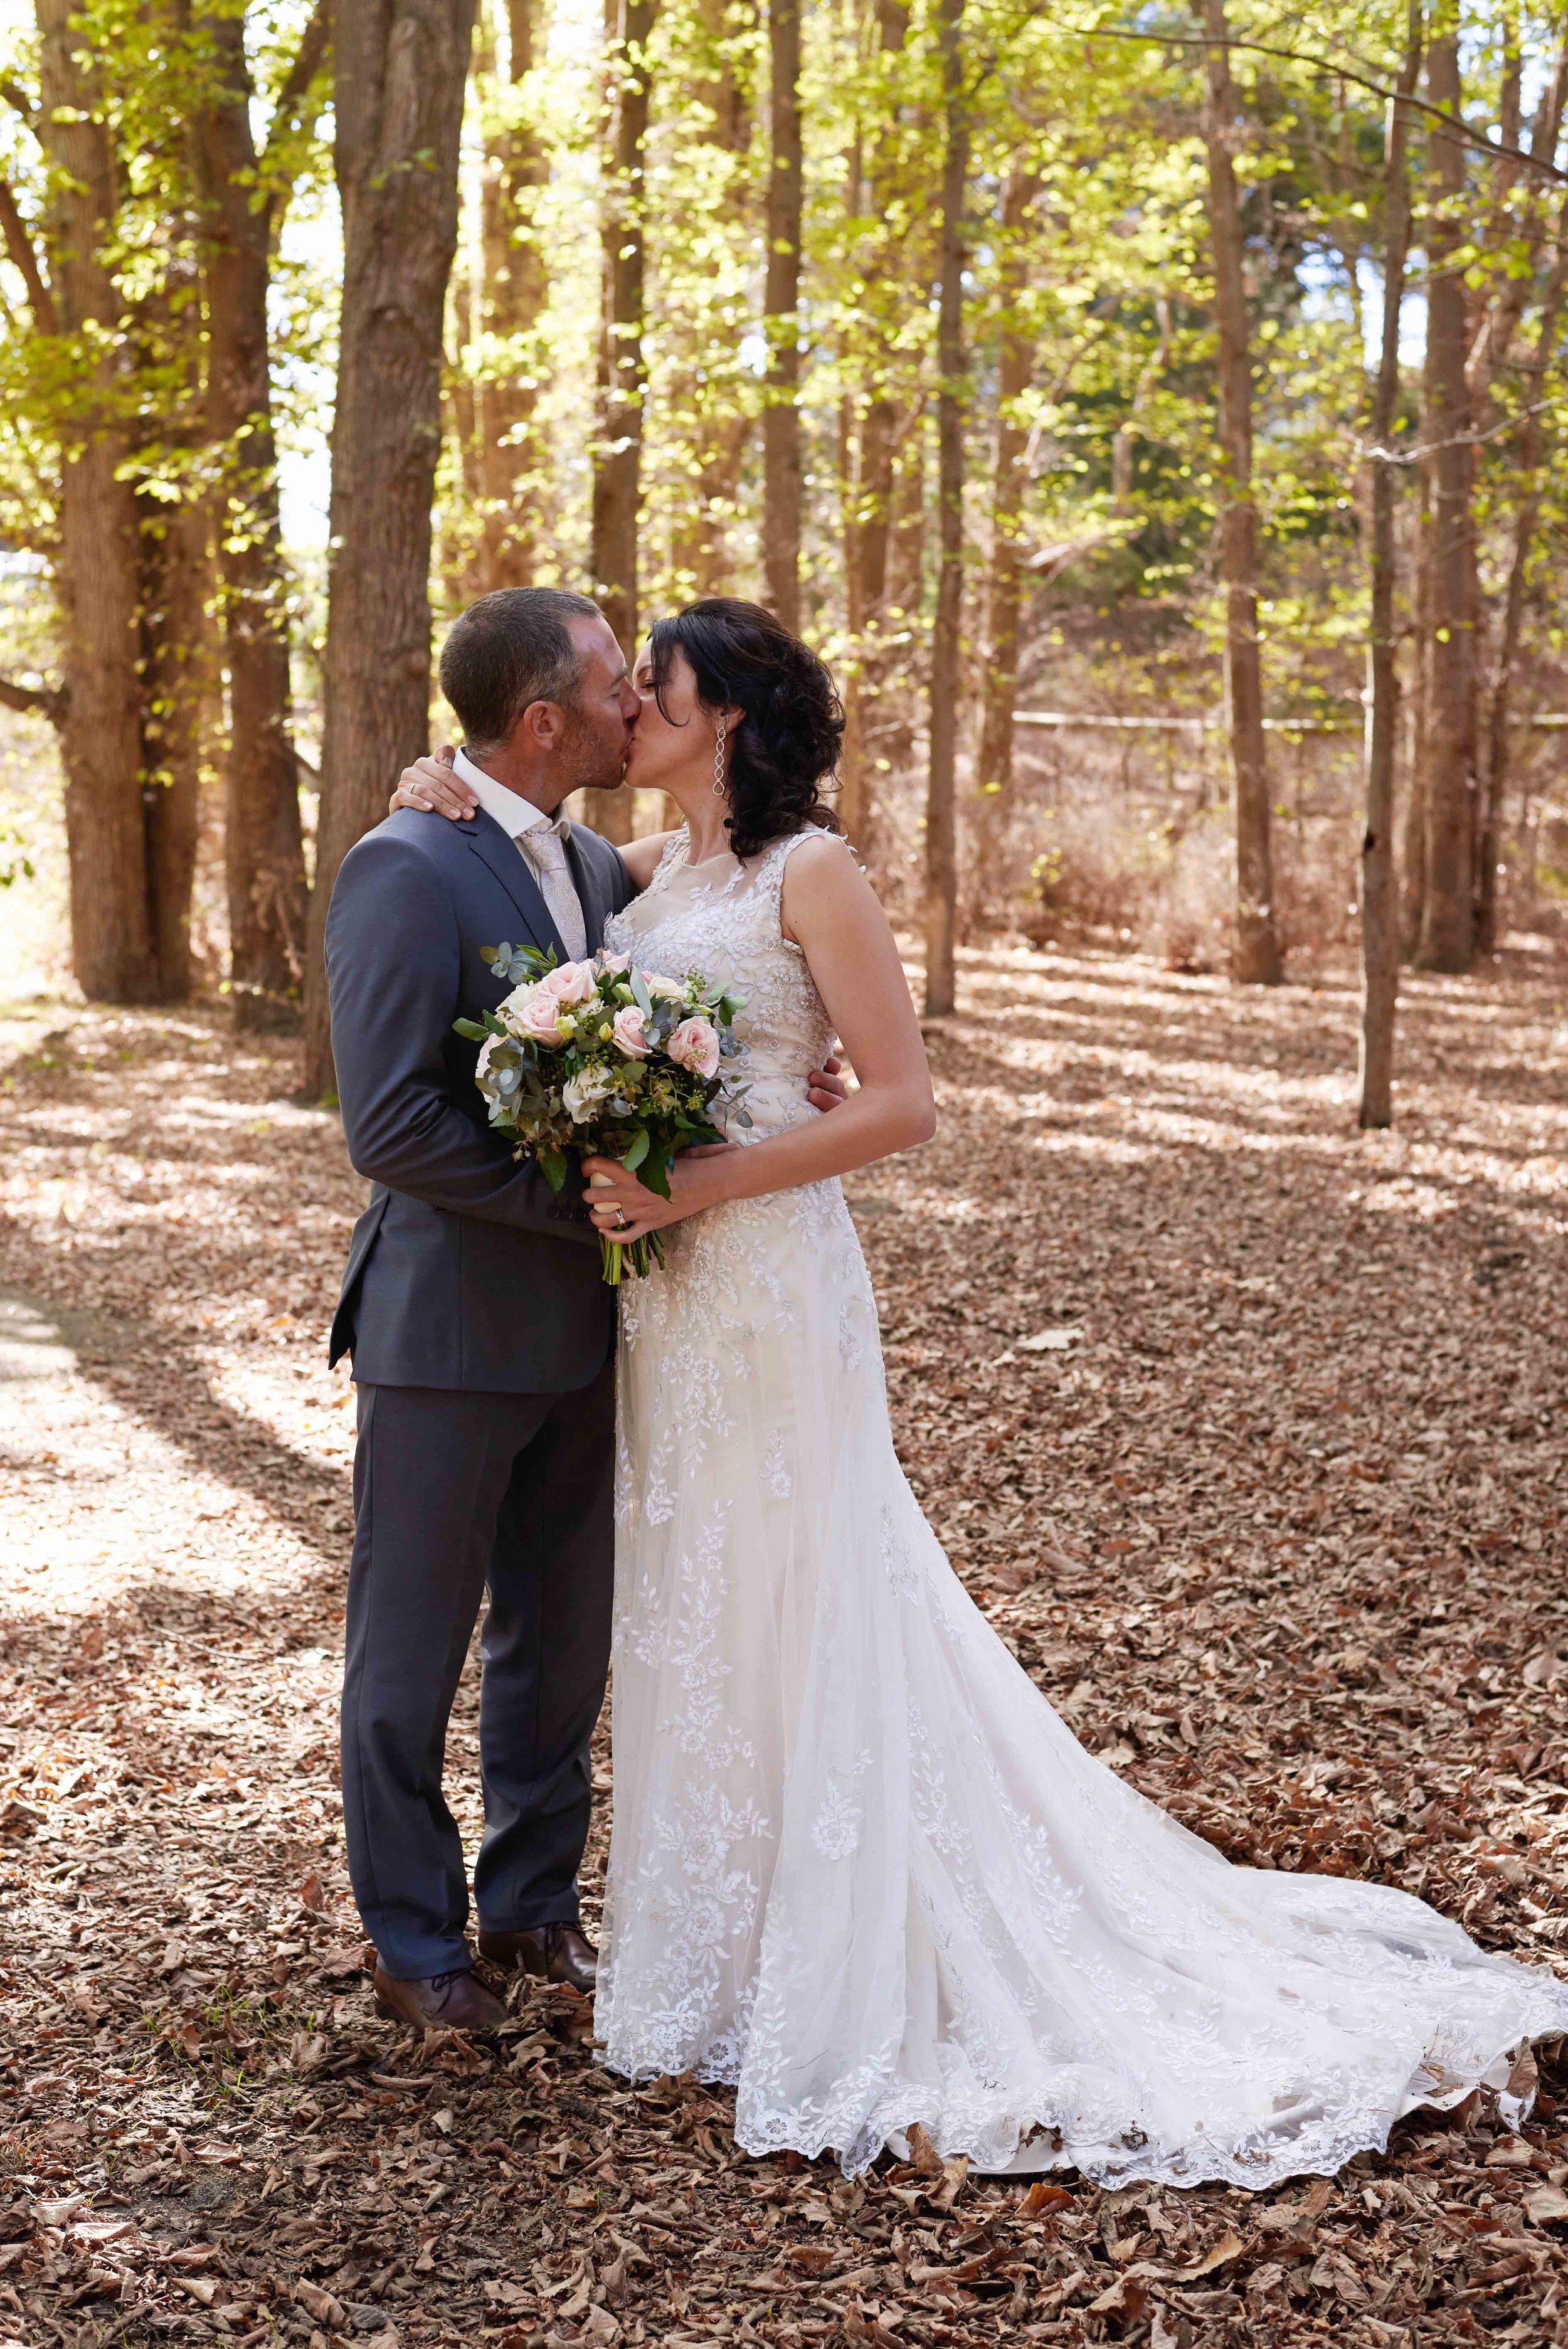 sorrento-wedding-photography-all-smiles-marissa-jade-photography-142.jpg